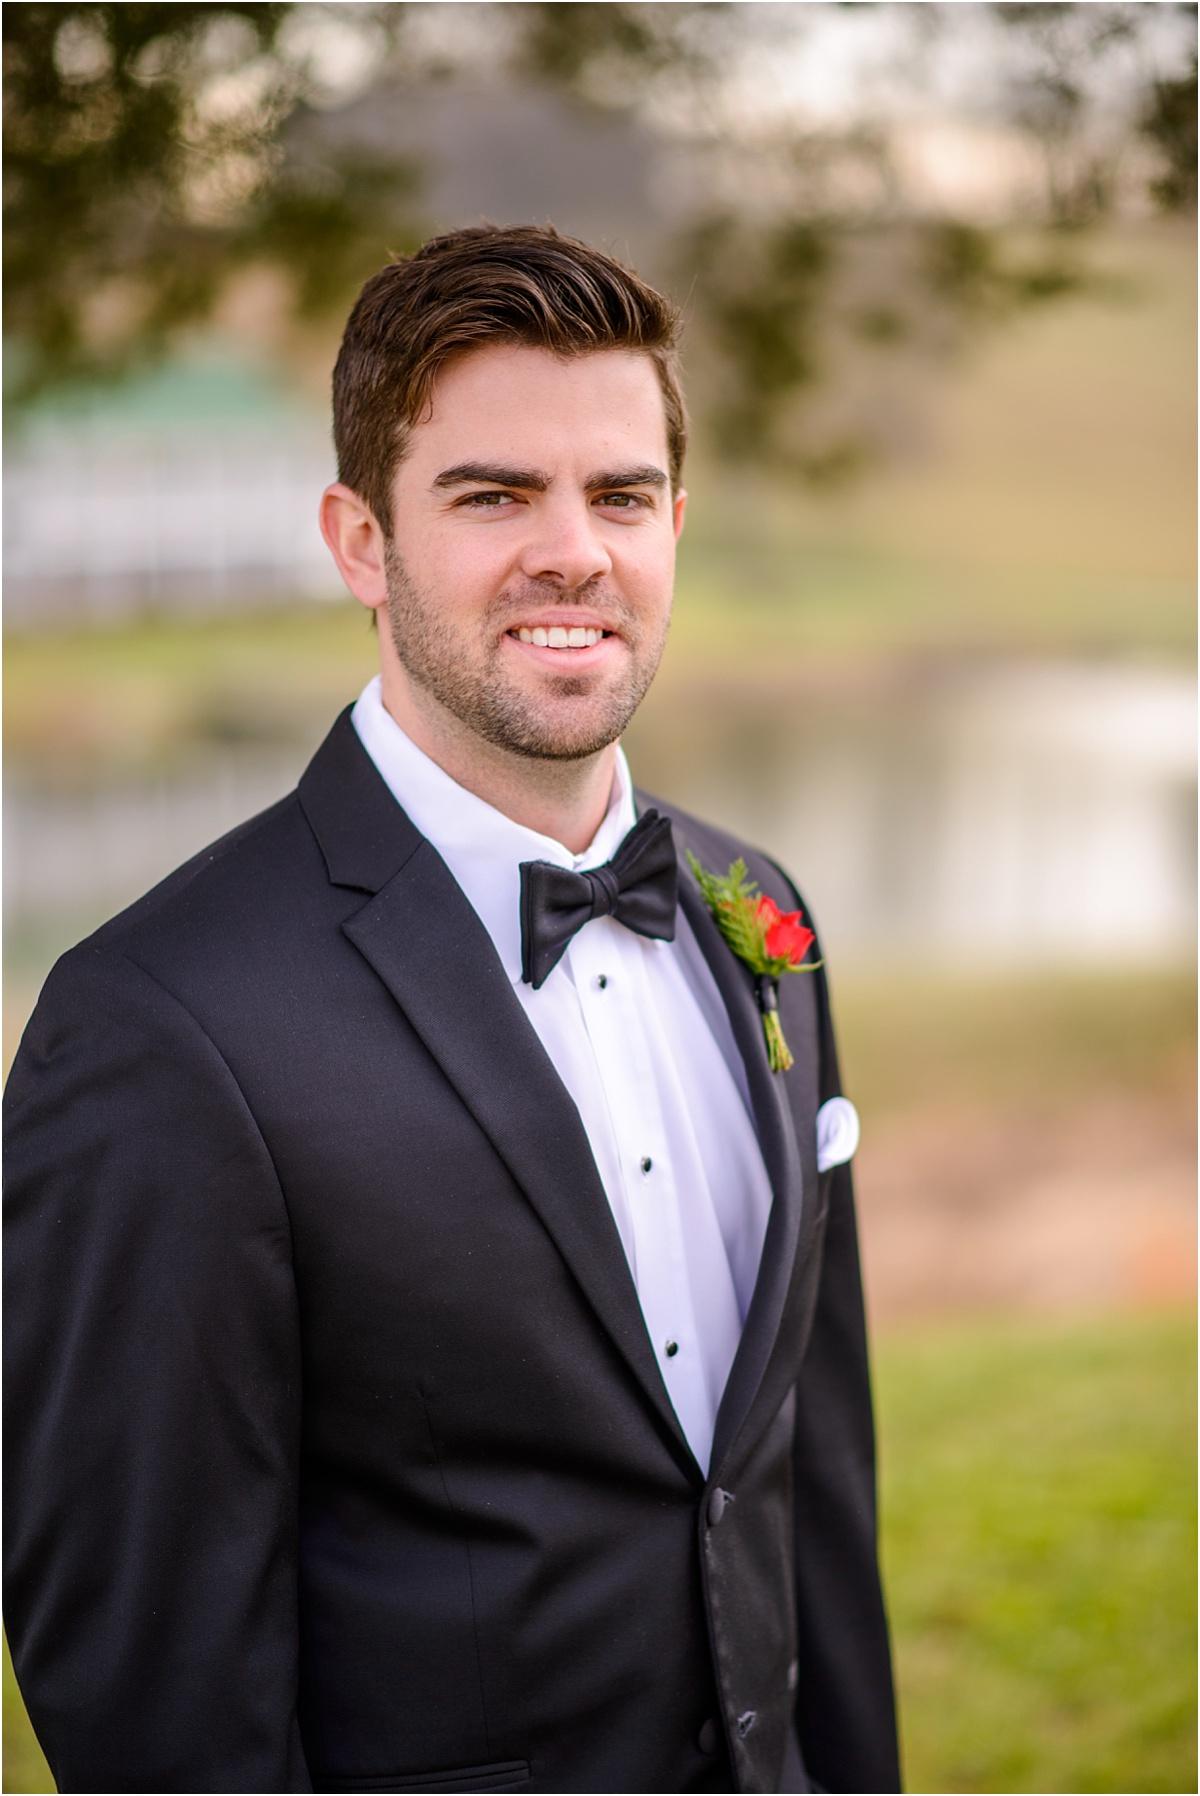 Greg Smit Photography Nashville wedding photographer Mint Springs Farm_0006